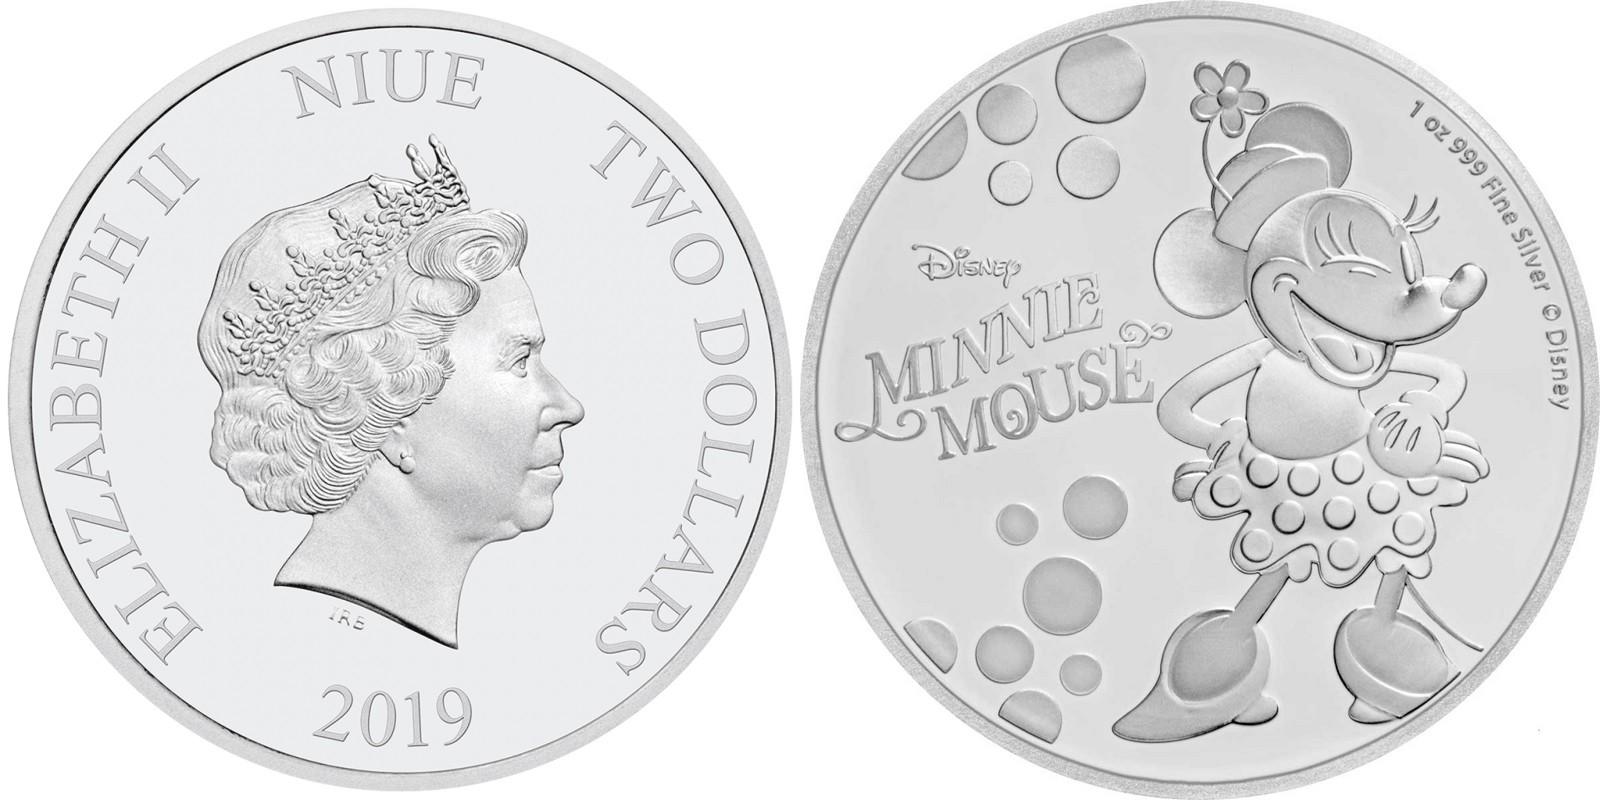 niue-2019-minnie-mouse